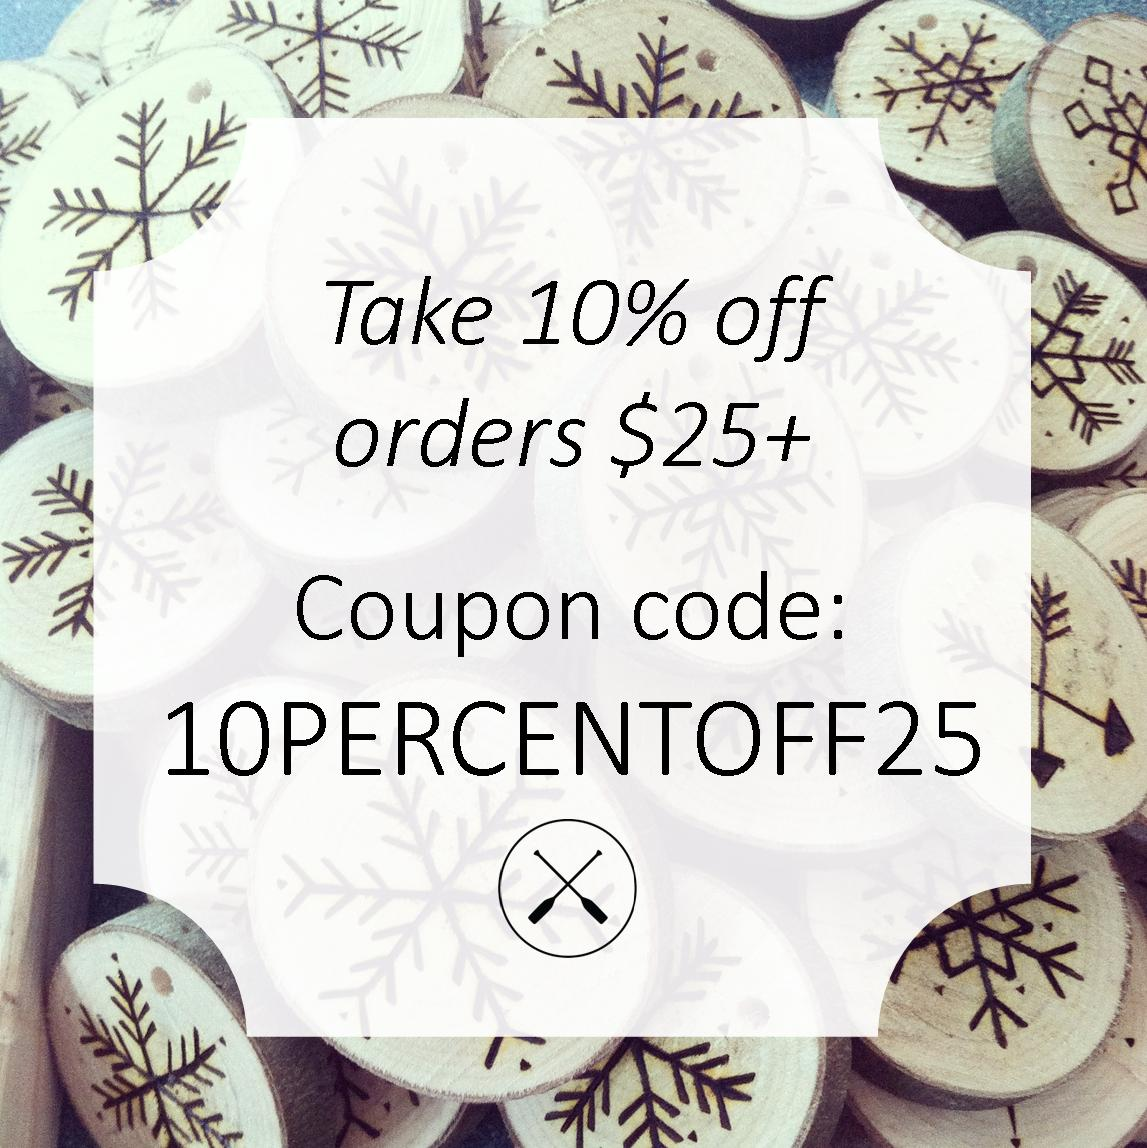 Birch Landing Home coupon code 10% off